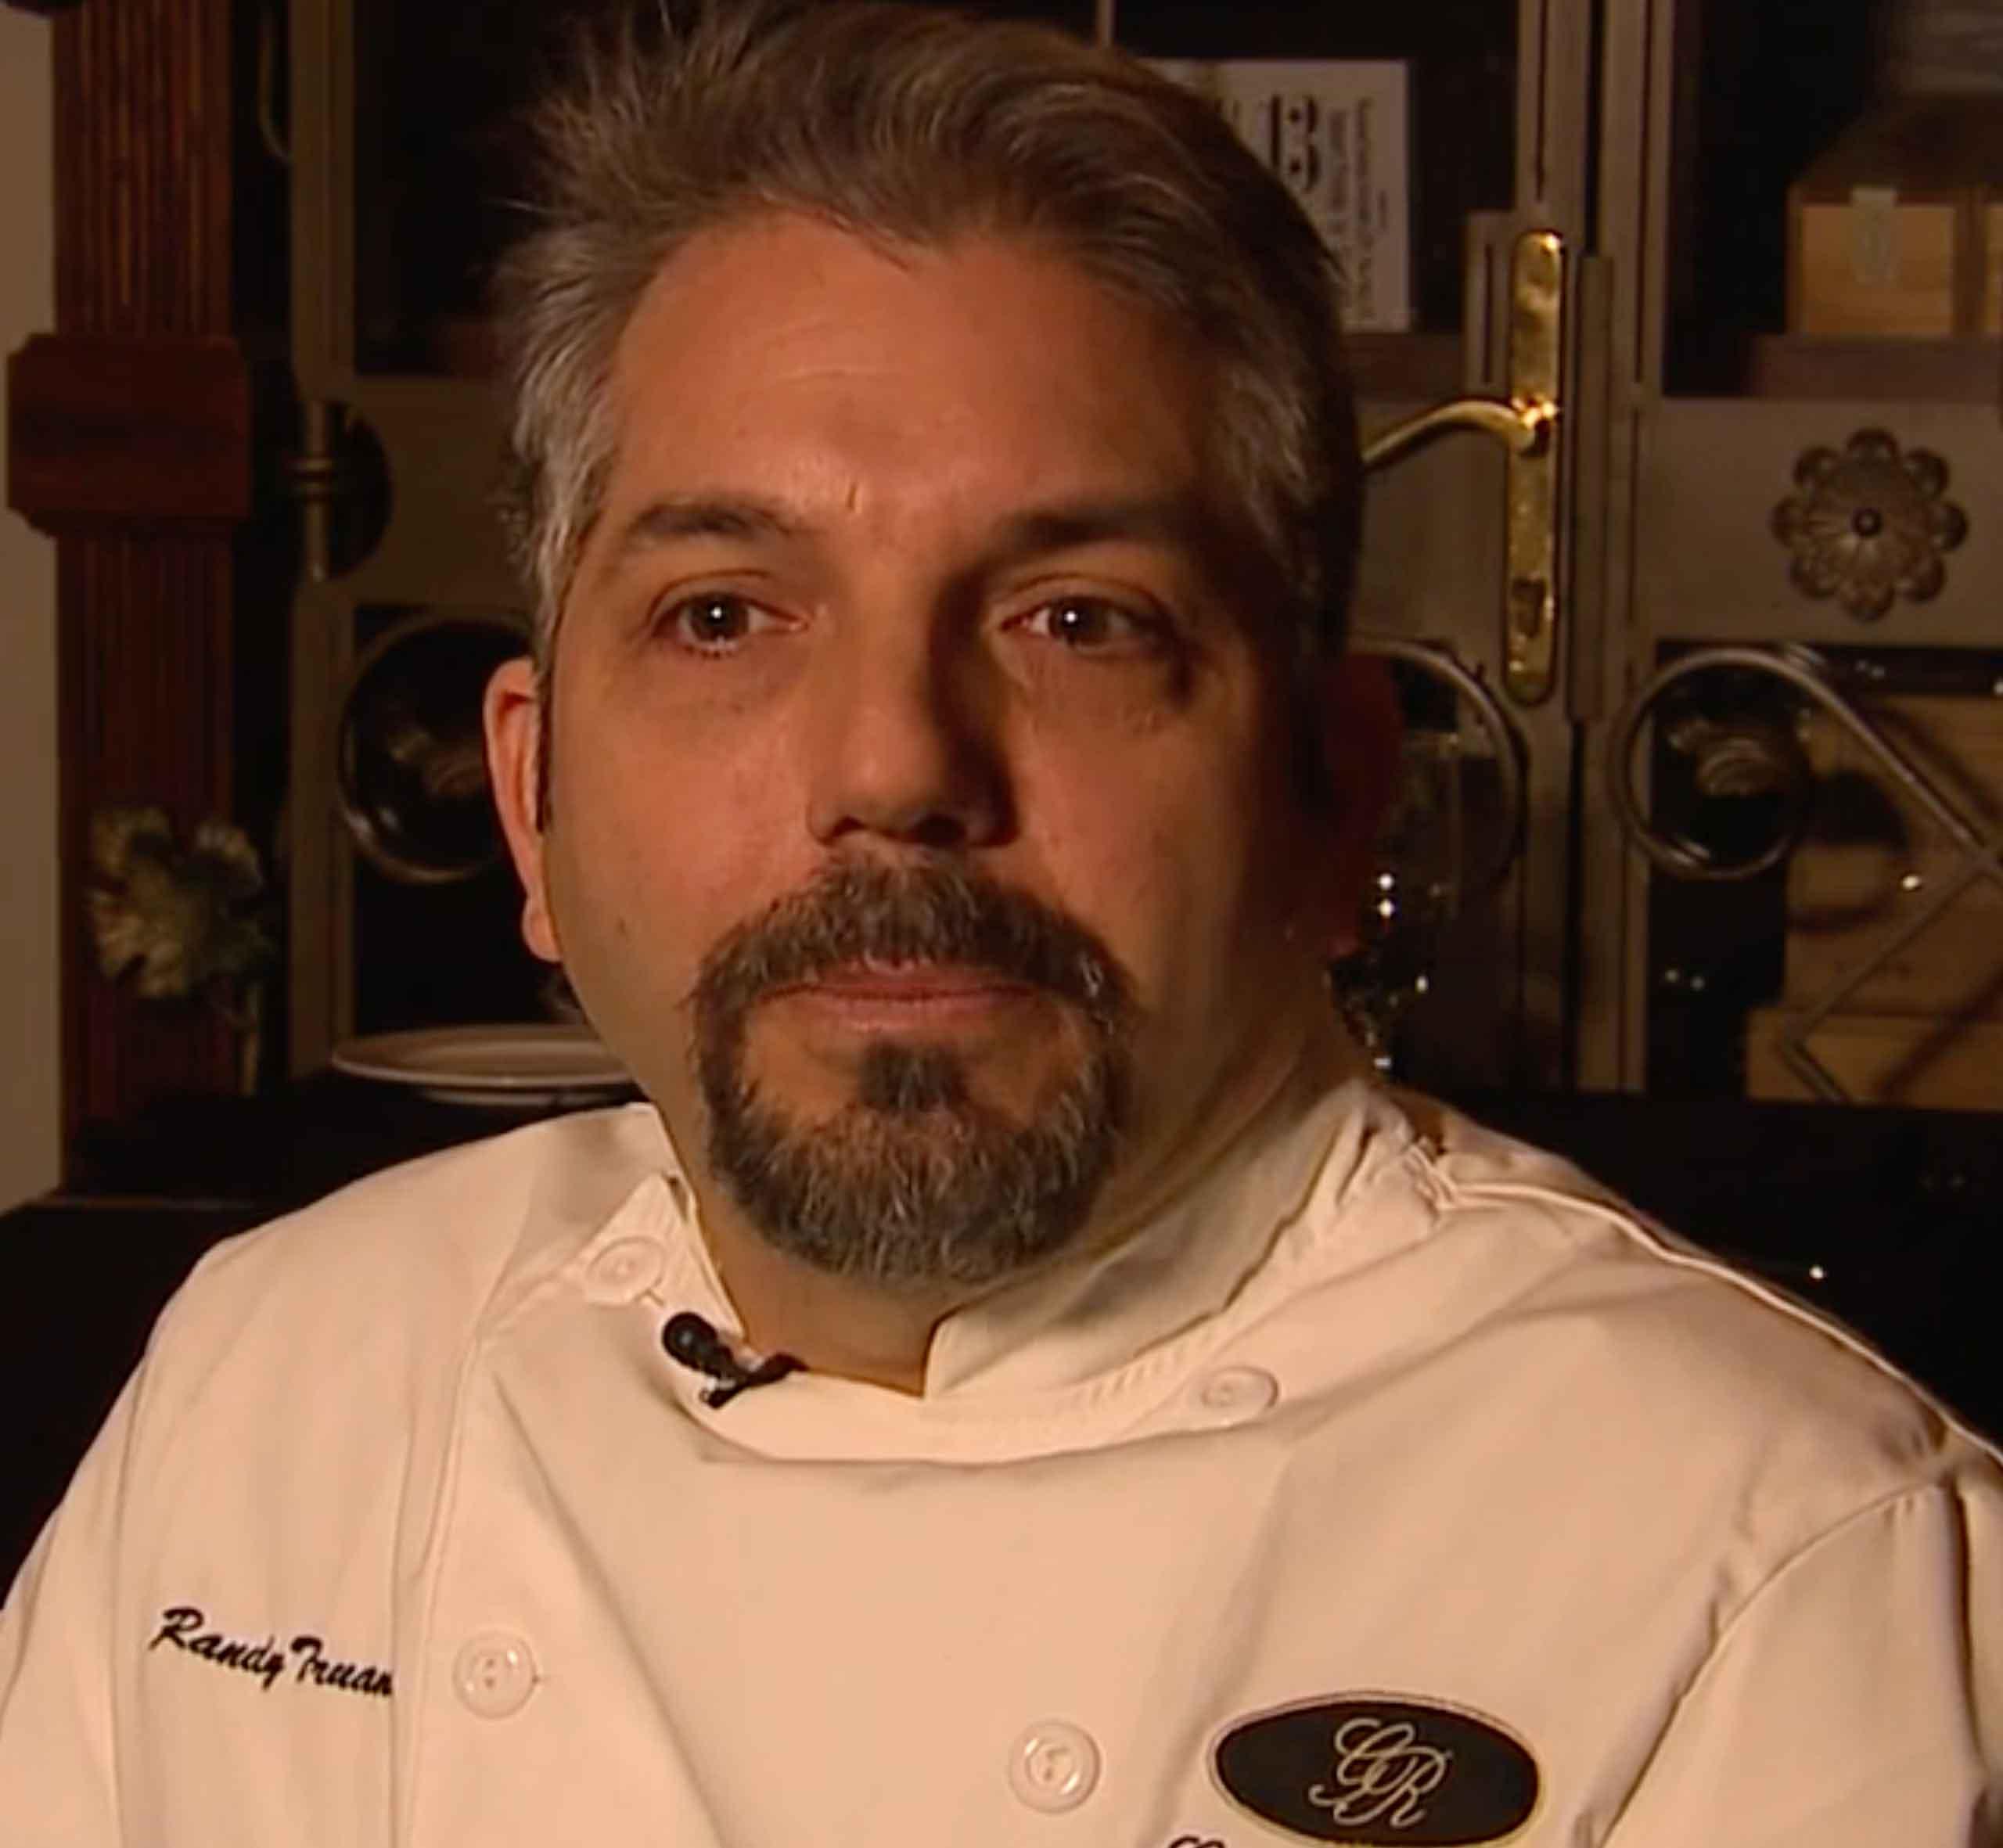 Frances Cannarsa Truant, Chef Randy Truant